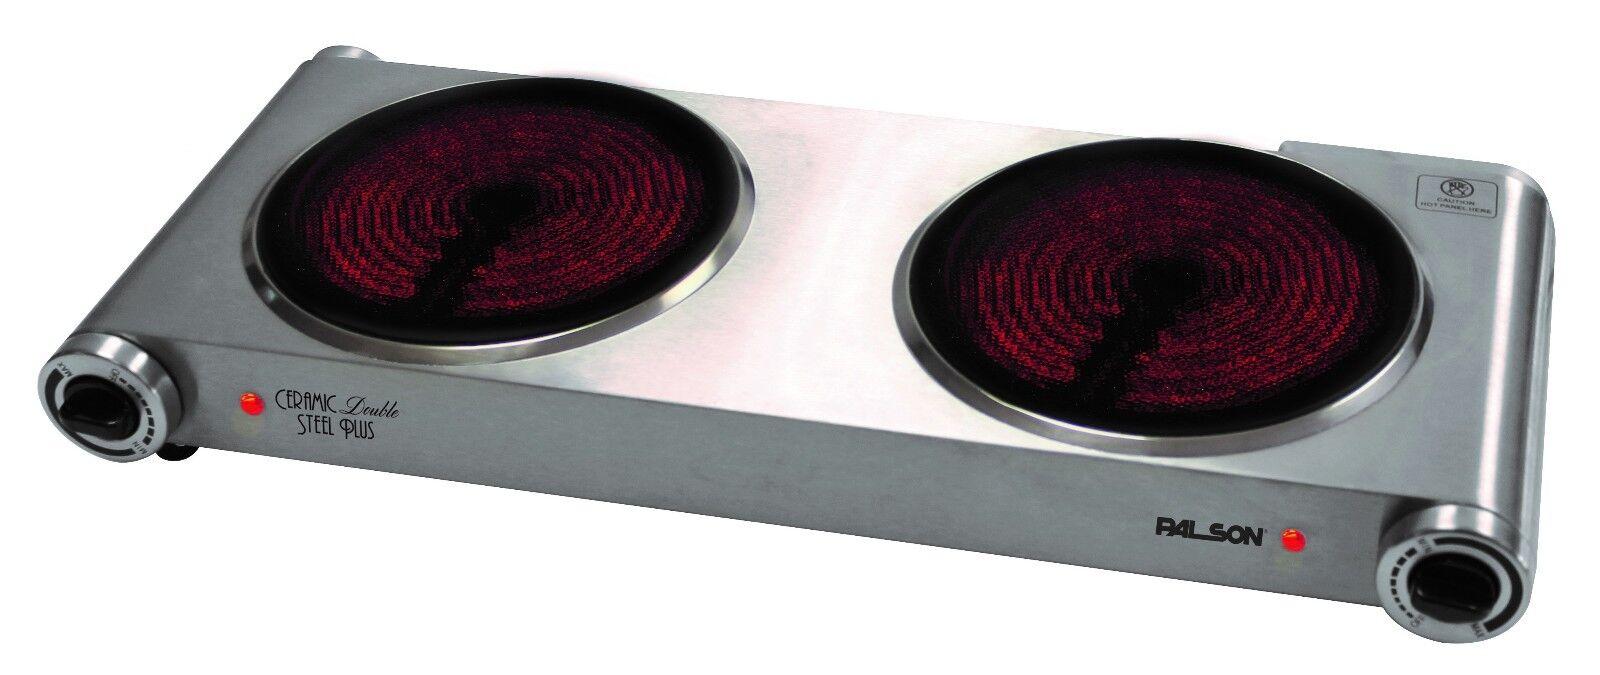 Palson Ceramic Electric 2400w Hot Plate Portable Hob